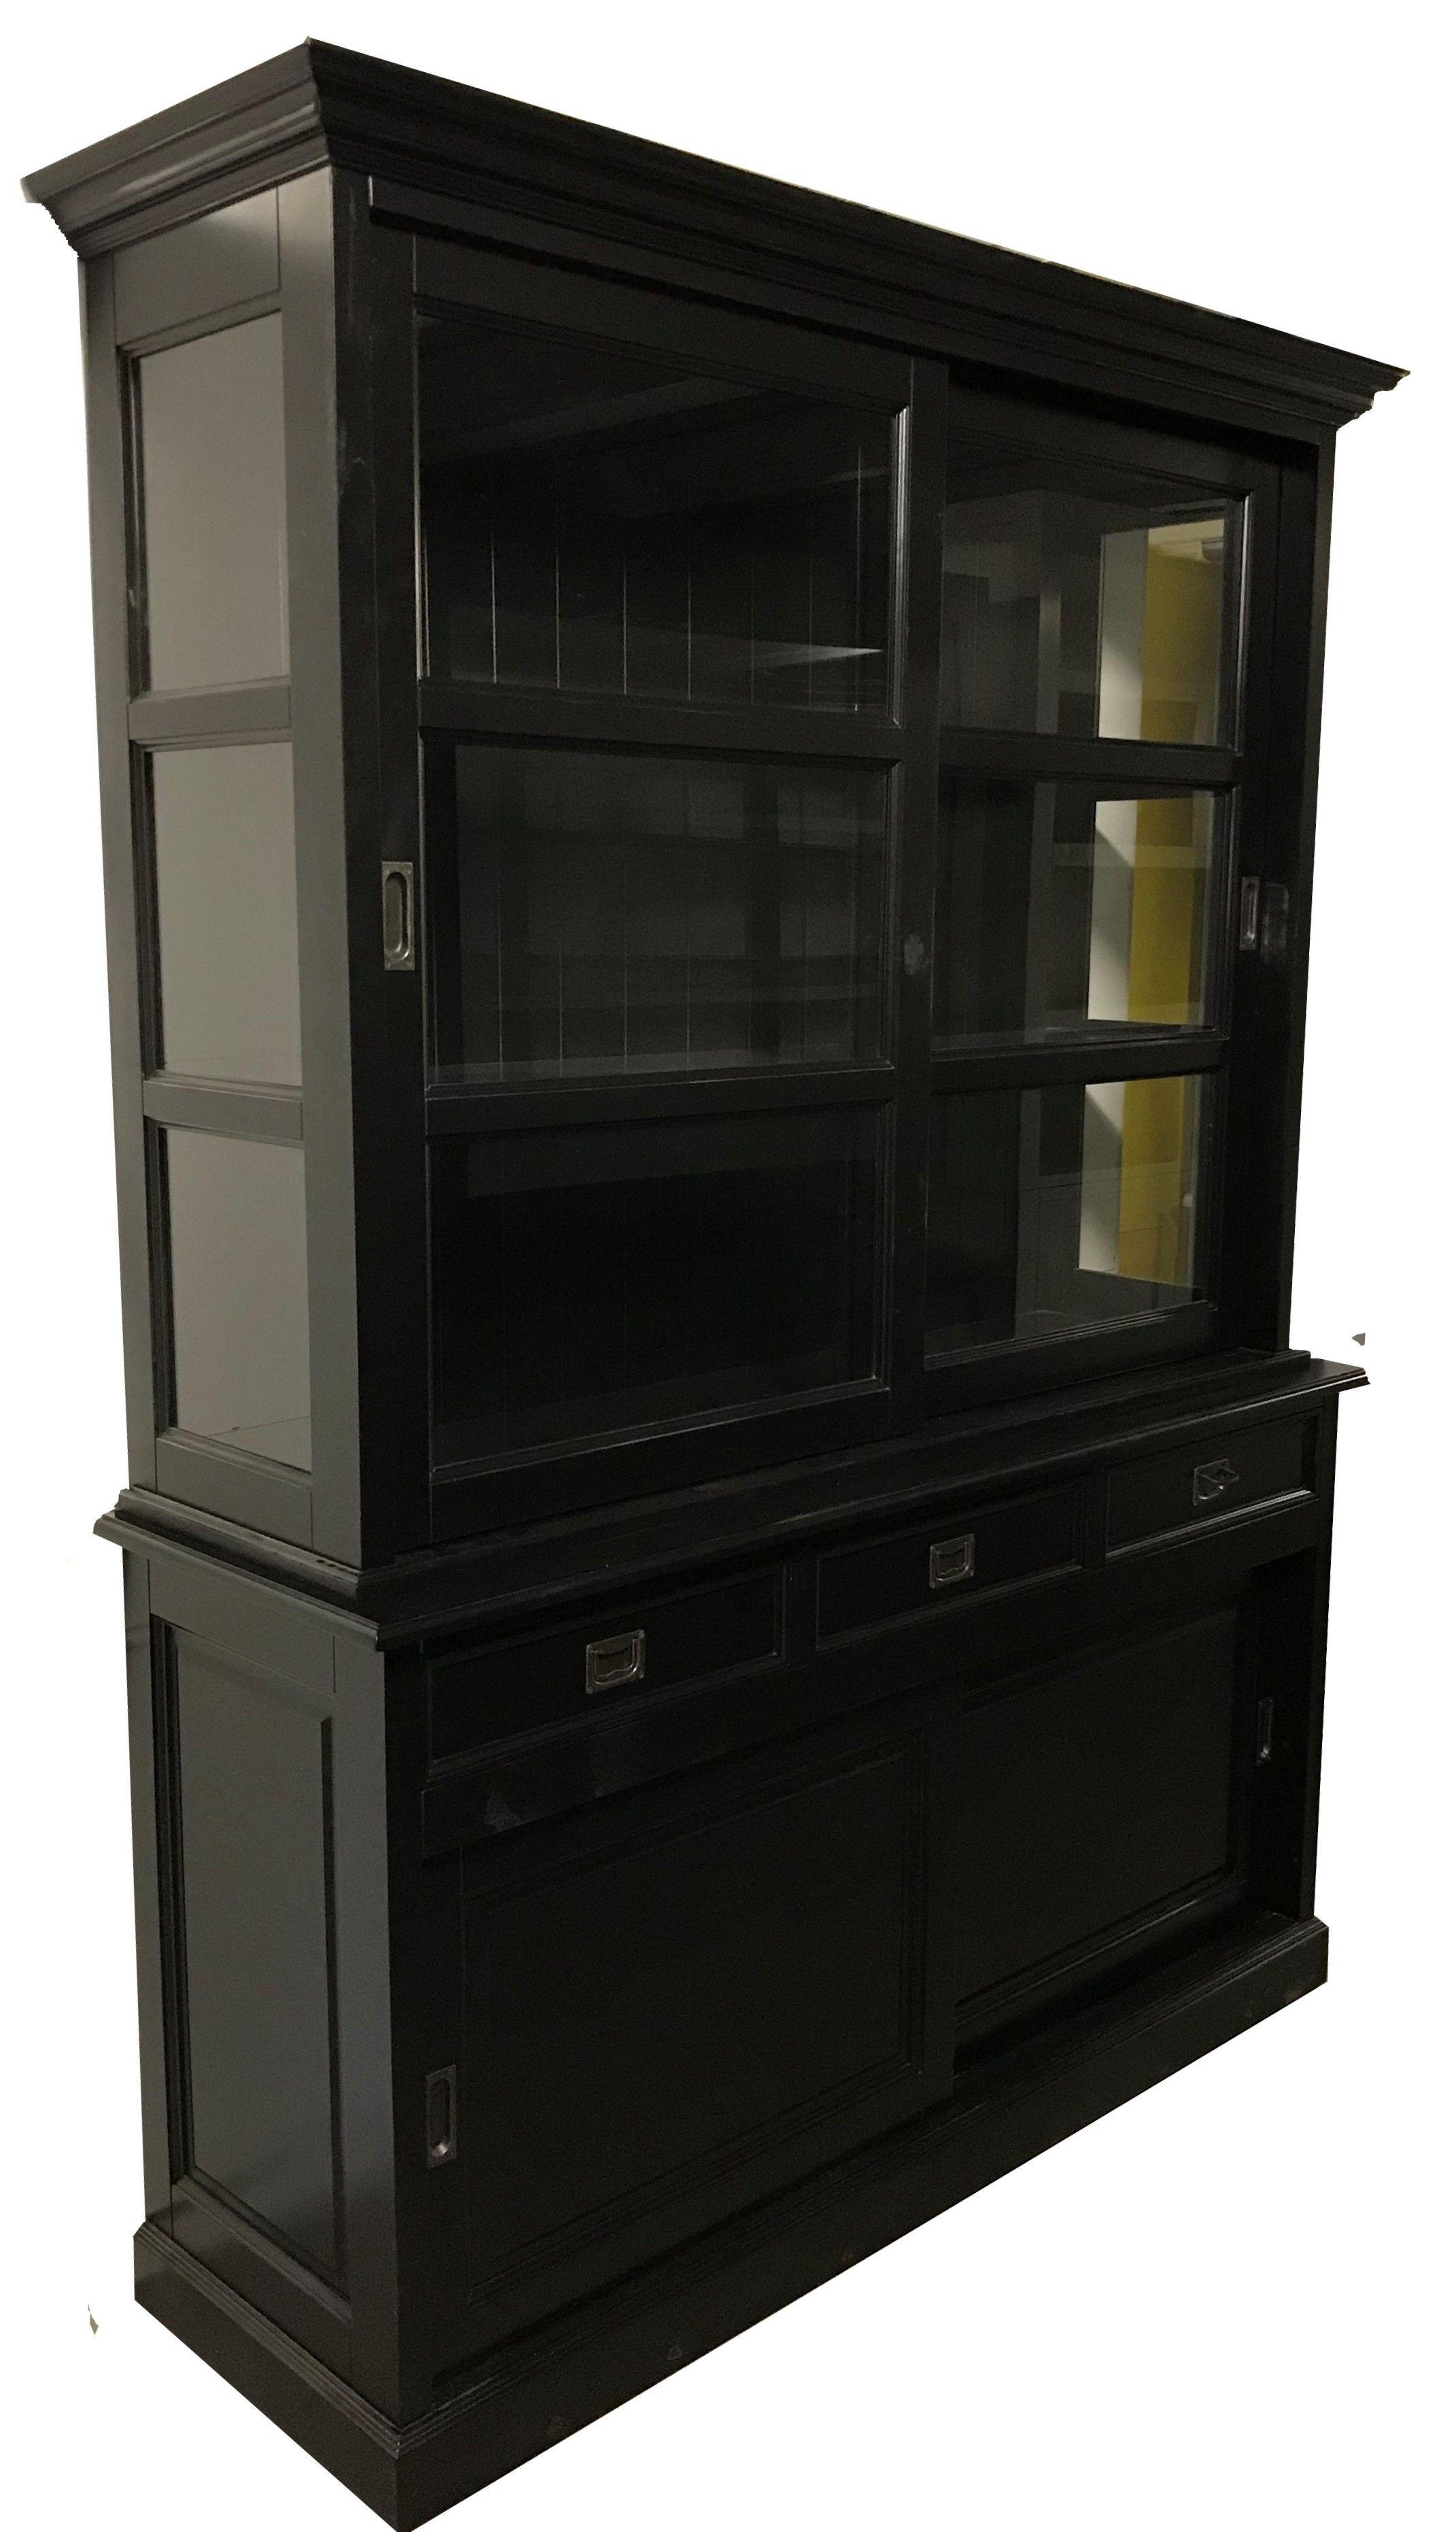 Zwarte Dichte Kast.Buffetkast Zwart Zwart Montfoort 160cm Sfeervolle Kast Met